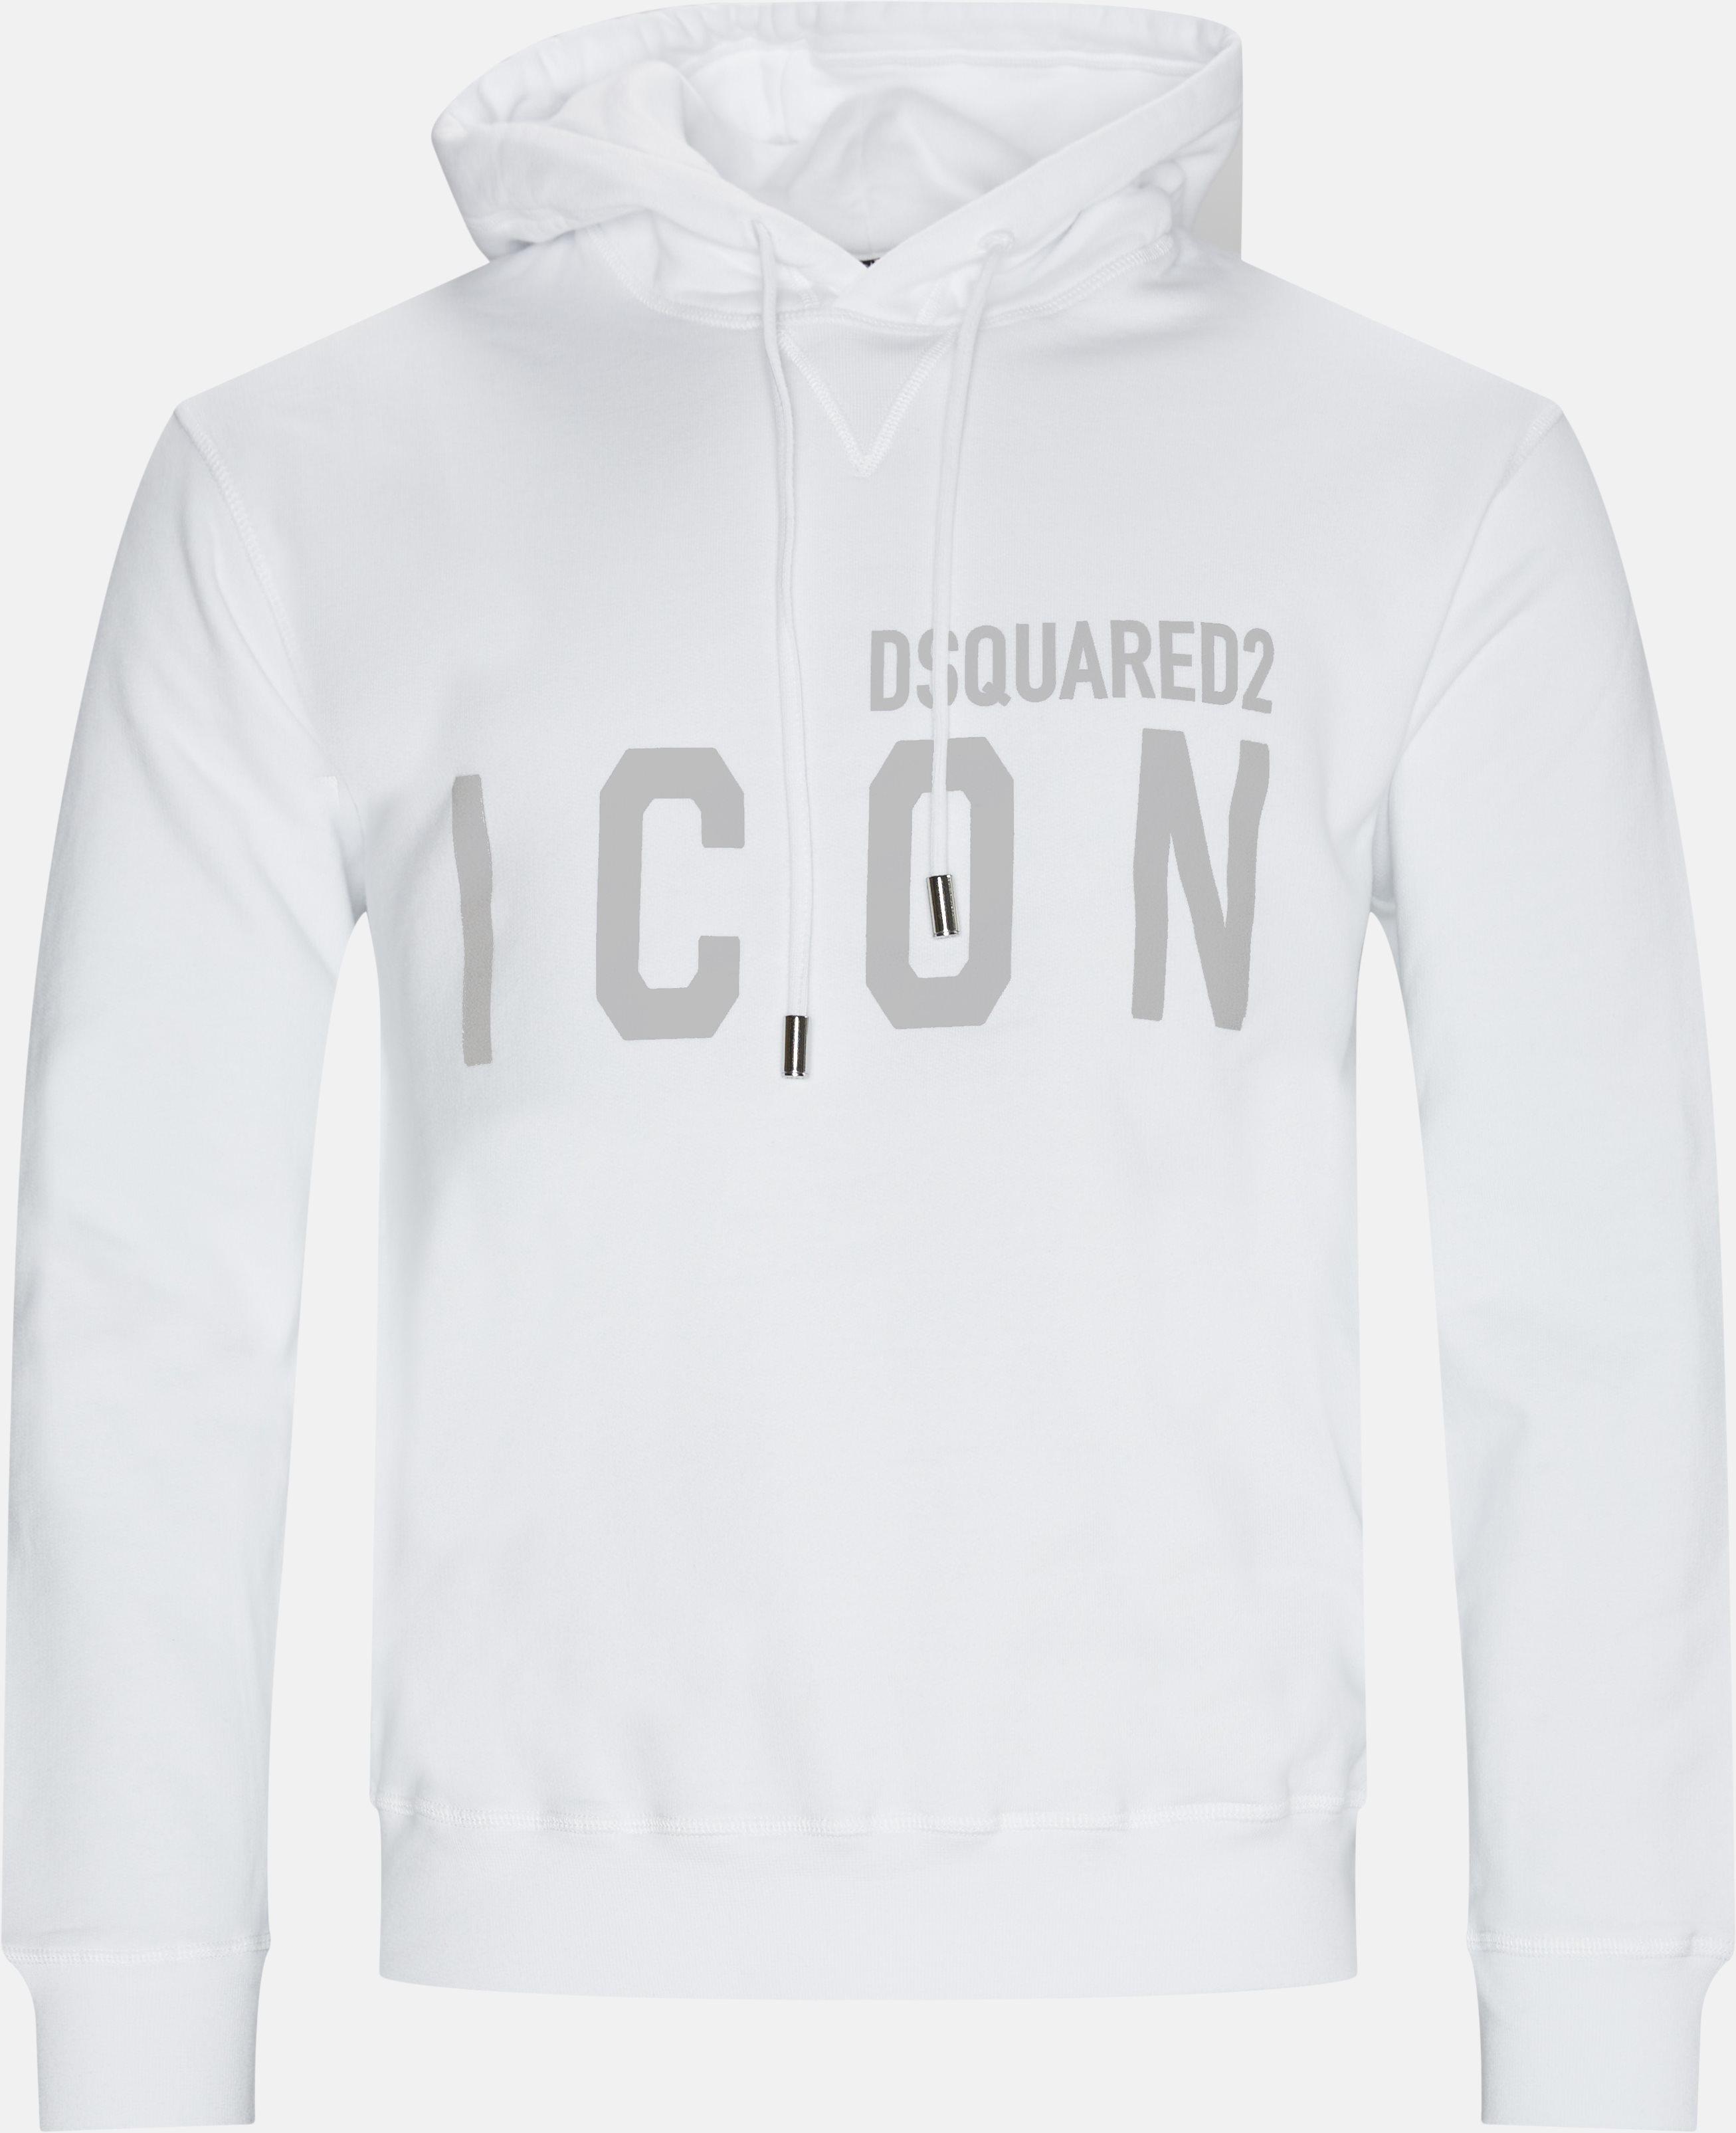 Sweatshirts - Regular fit - White